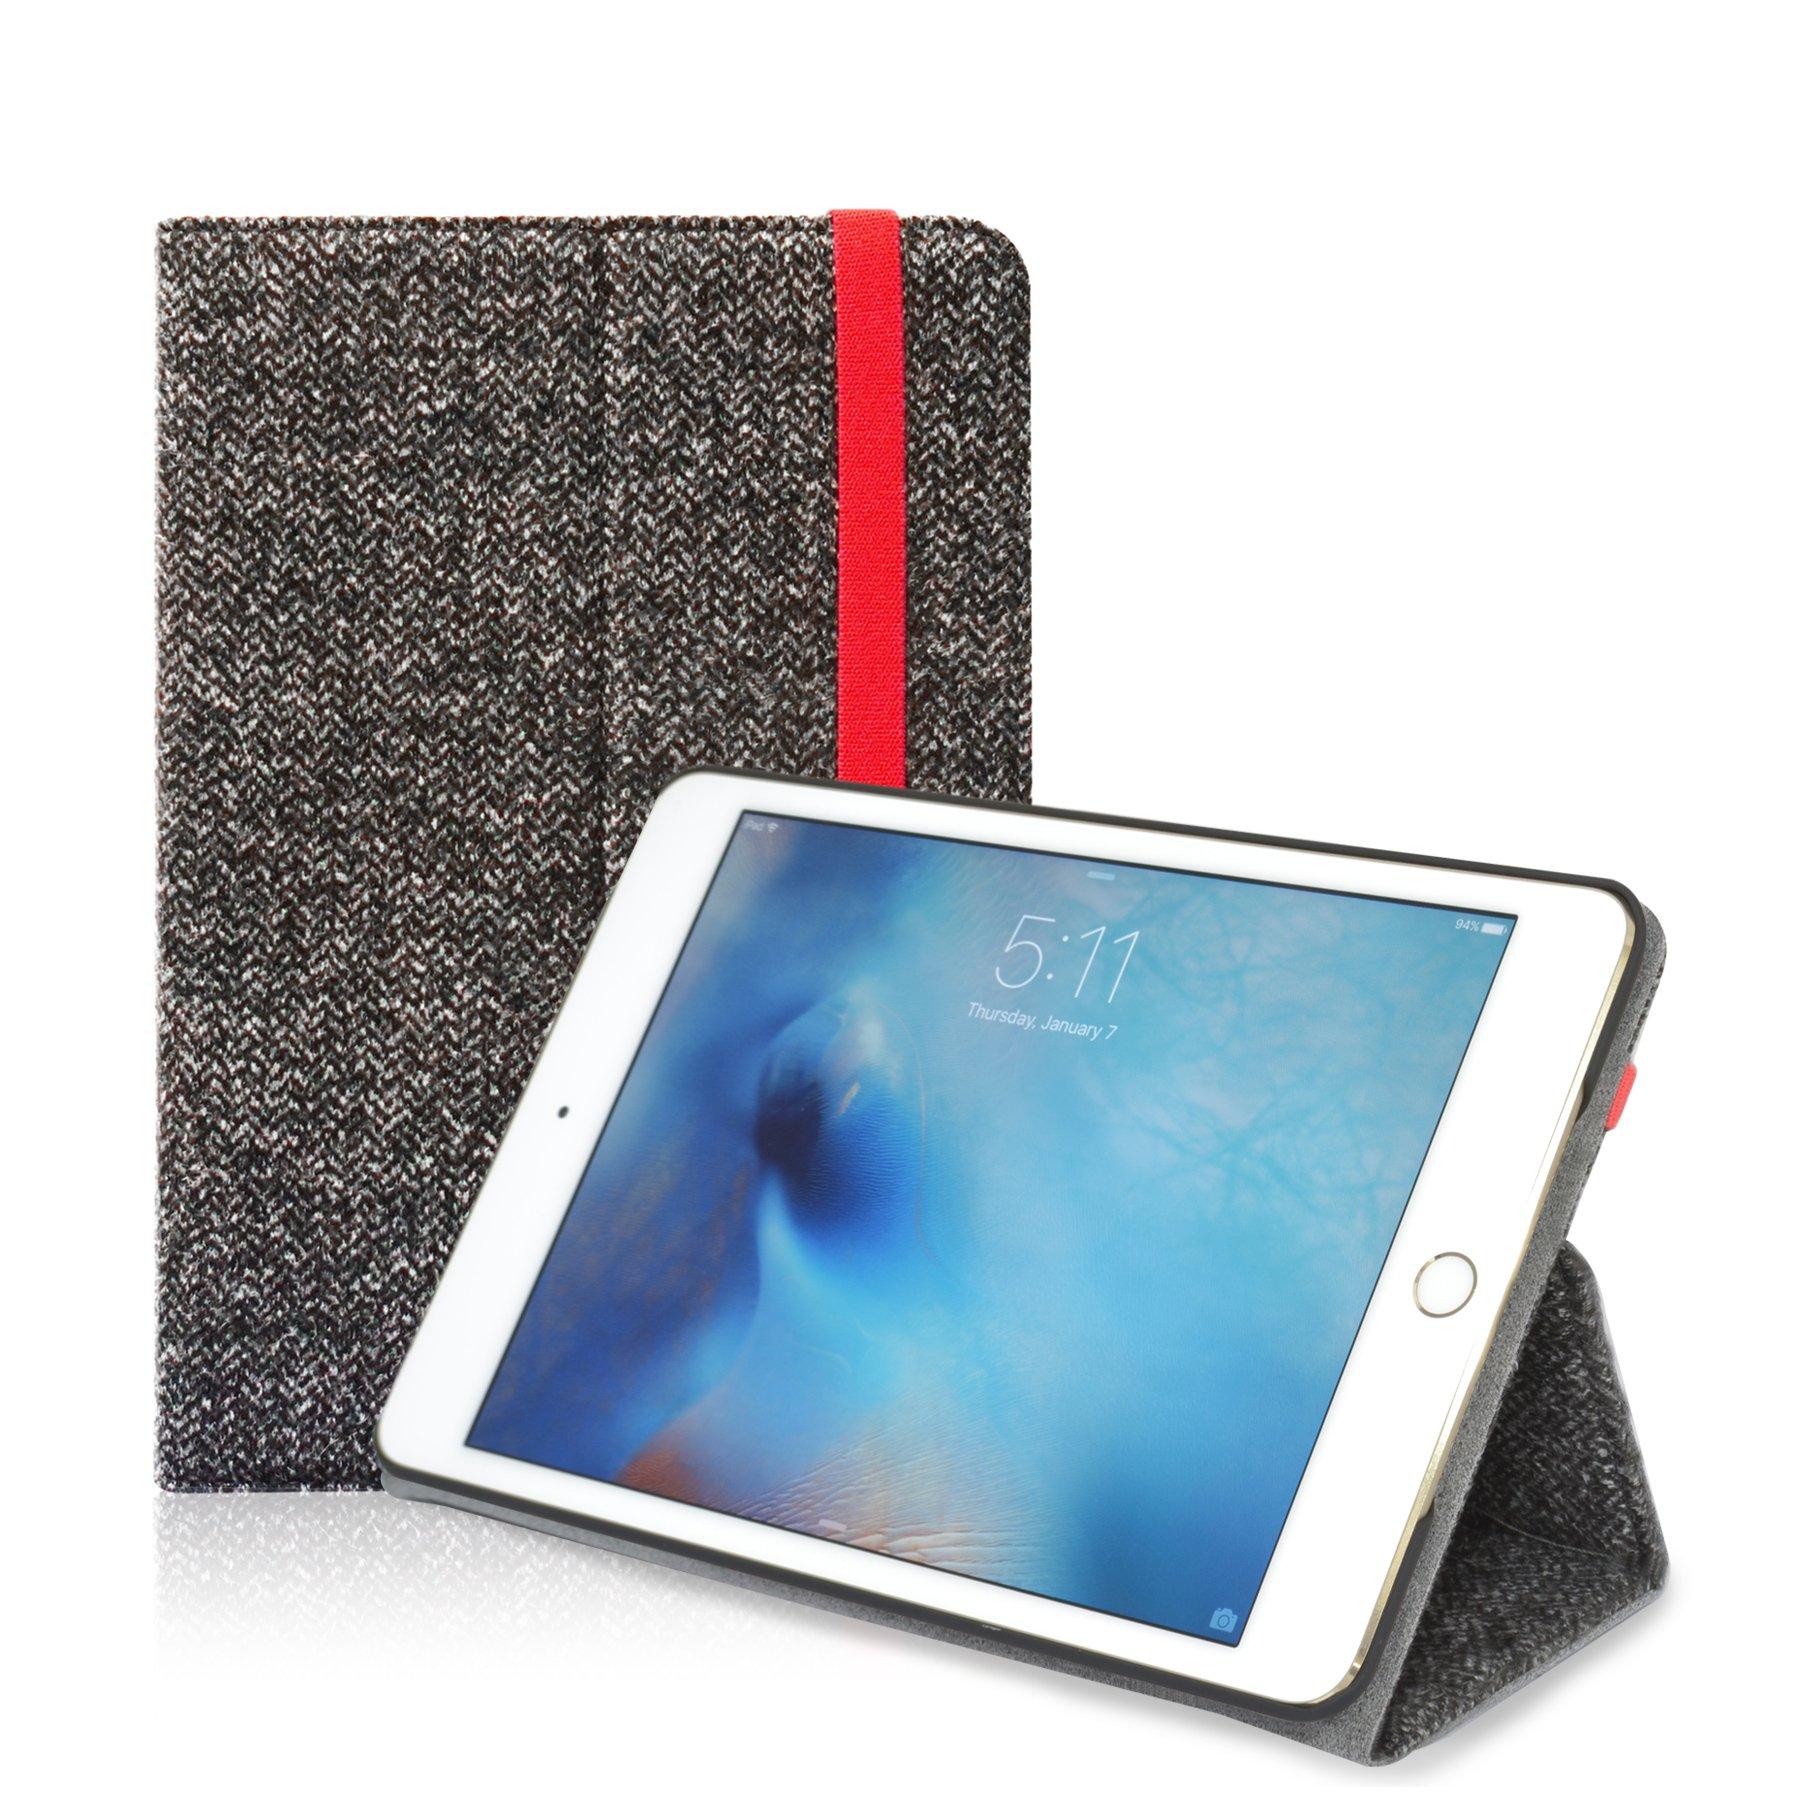 Araree iPad mini 4 Case, [Neat Diary] Slim Fit Premium Fabric Folio Stand Smart Cover Case with elastic band for iPad mini 4 (2016) (Herringbone)